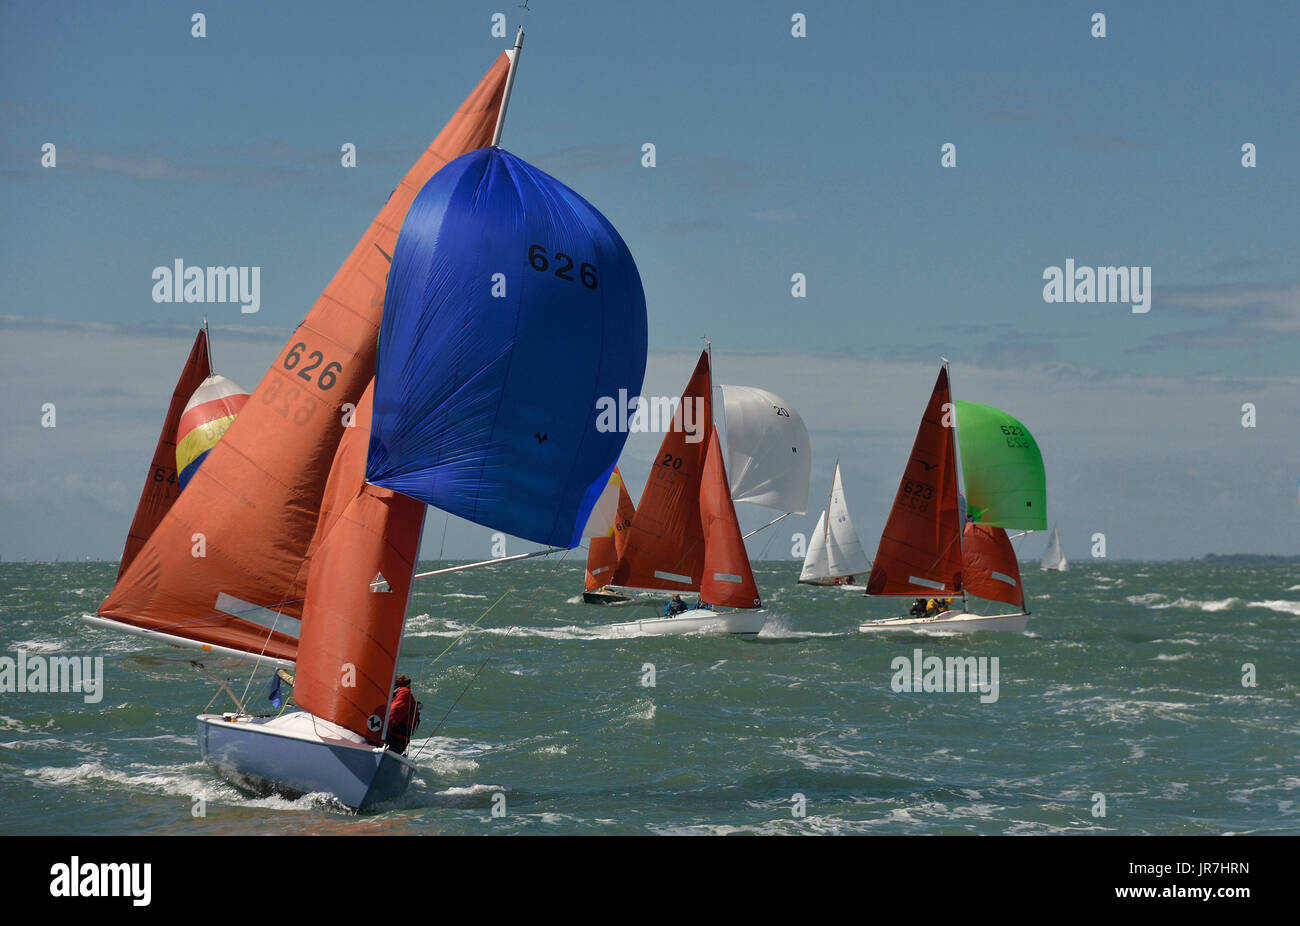 Cowes, UK. 4. August 2017. Lendy Cowes Woche Segeln alle Klassen Squib Klasse Boote Credit: Leo Mason Fotos/Alamy Stockfoto